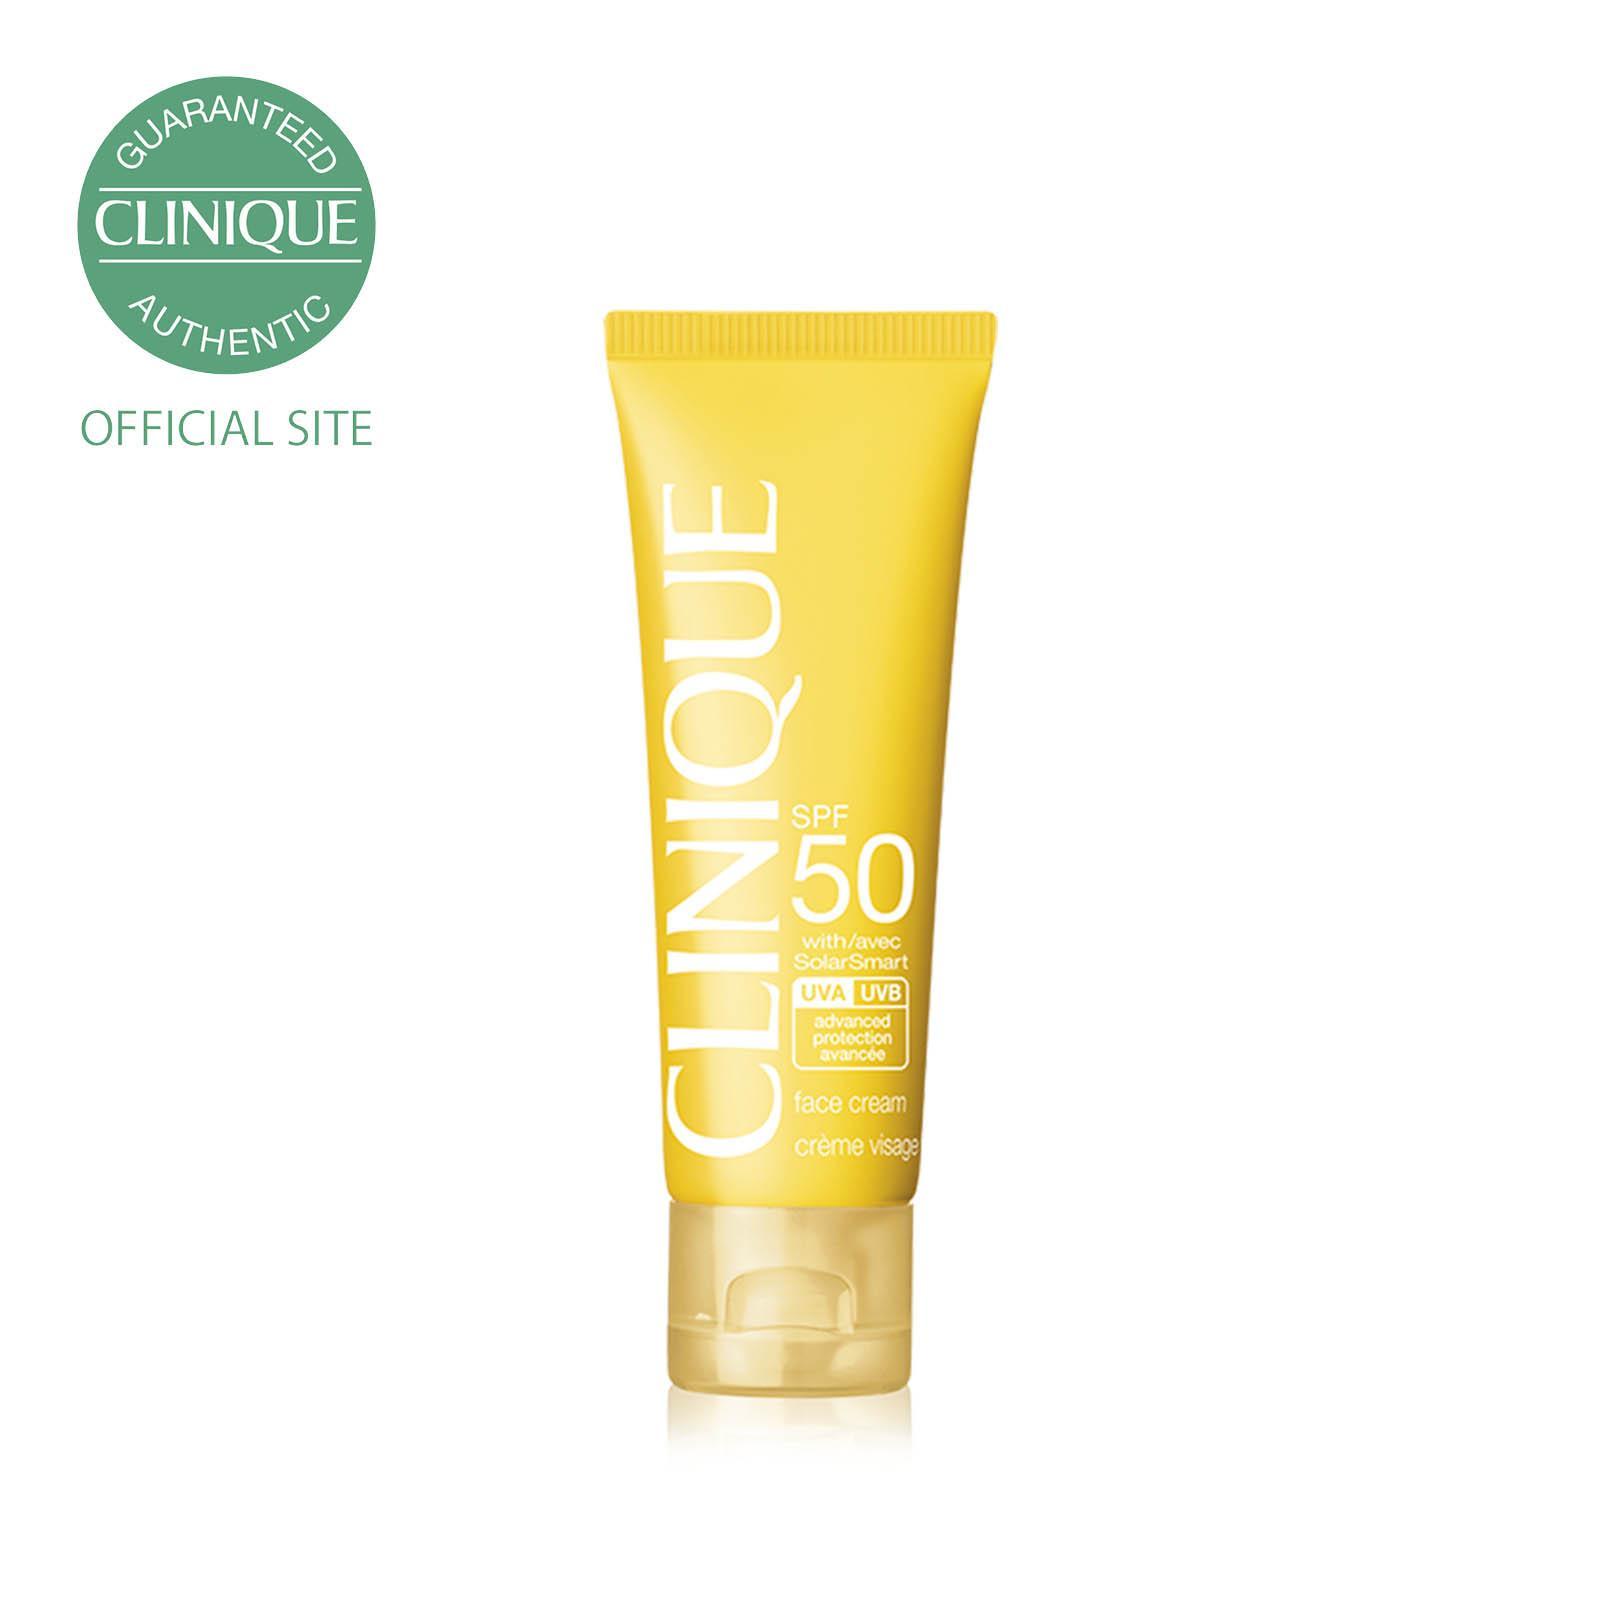 The Price Of Atomy Korea Sunscreen Spf 50 Pa 60ml Philippines Sunblock Banana Boat Spf50 Clinique Sun Face Cream 50ml